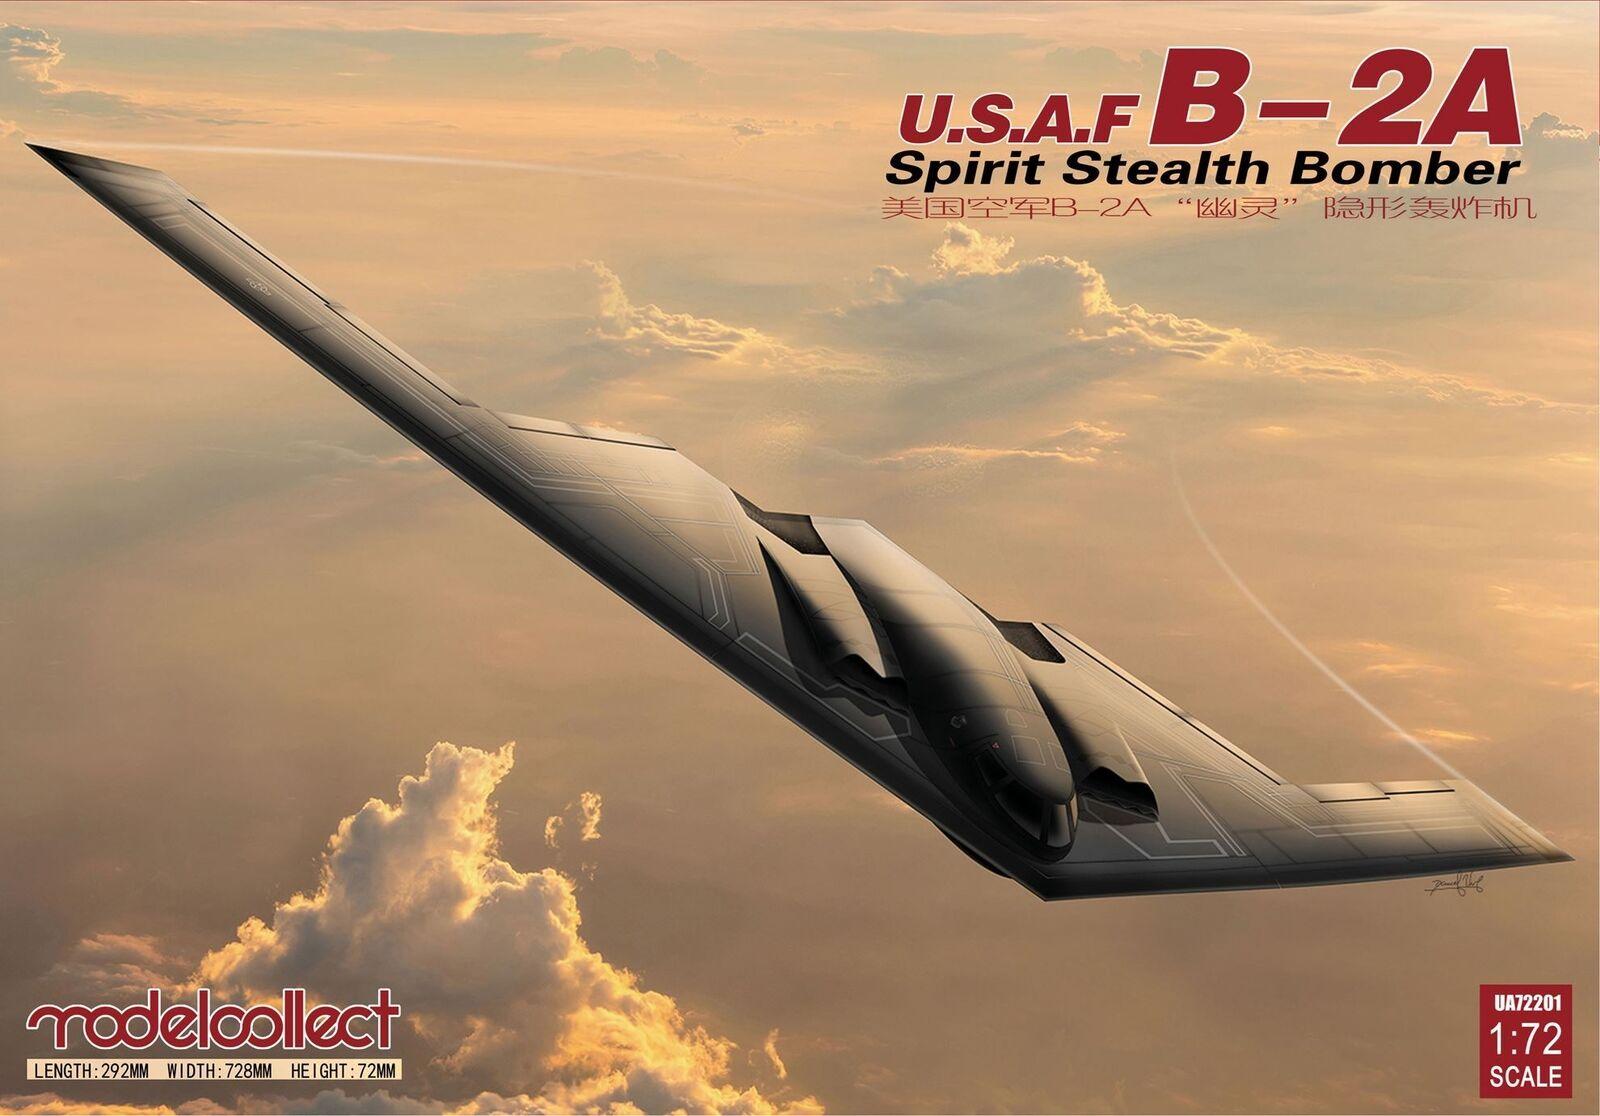 Modelcollect 1 72 U.S.A.F B-2A Spirit Stealth Bomber